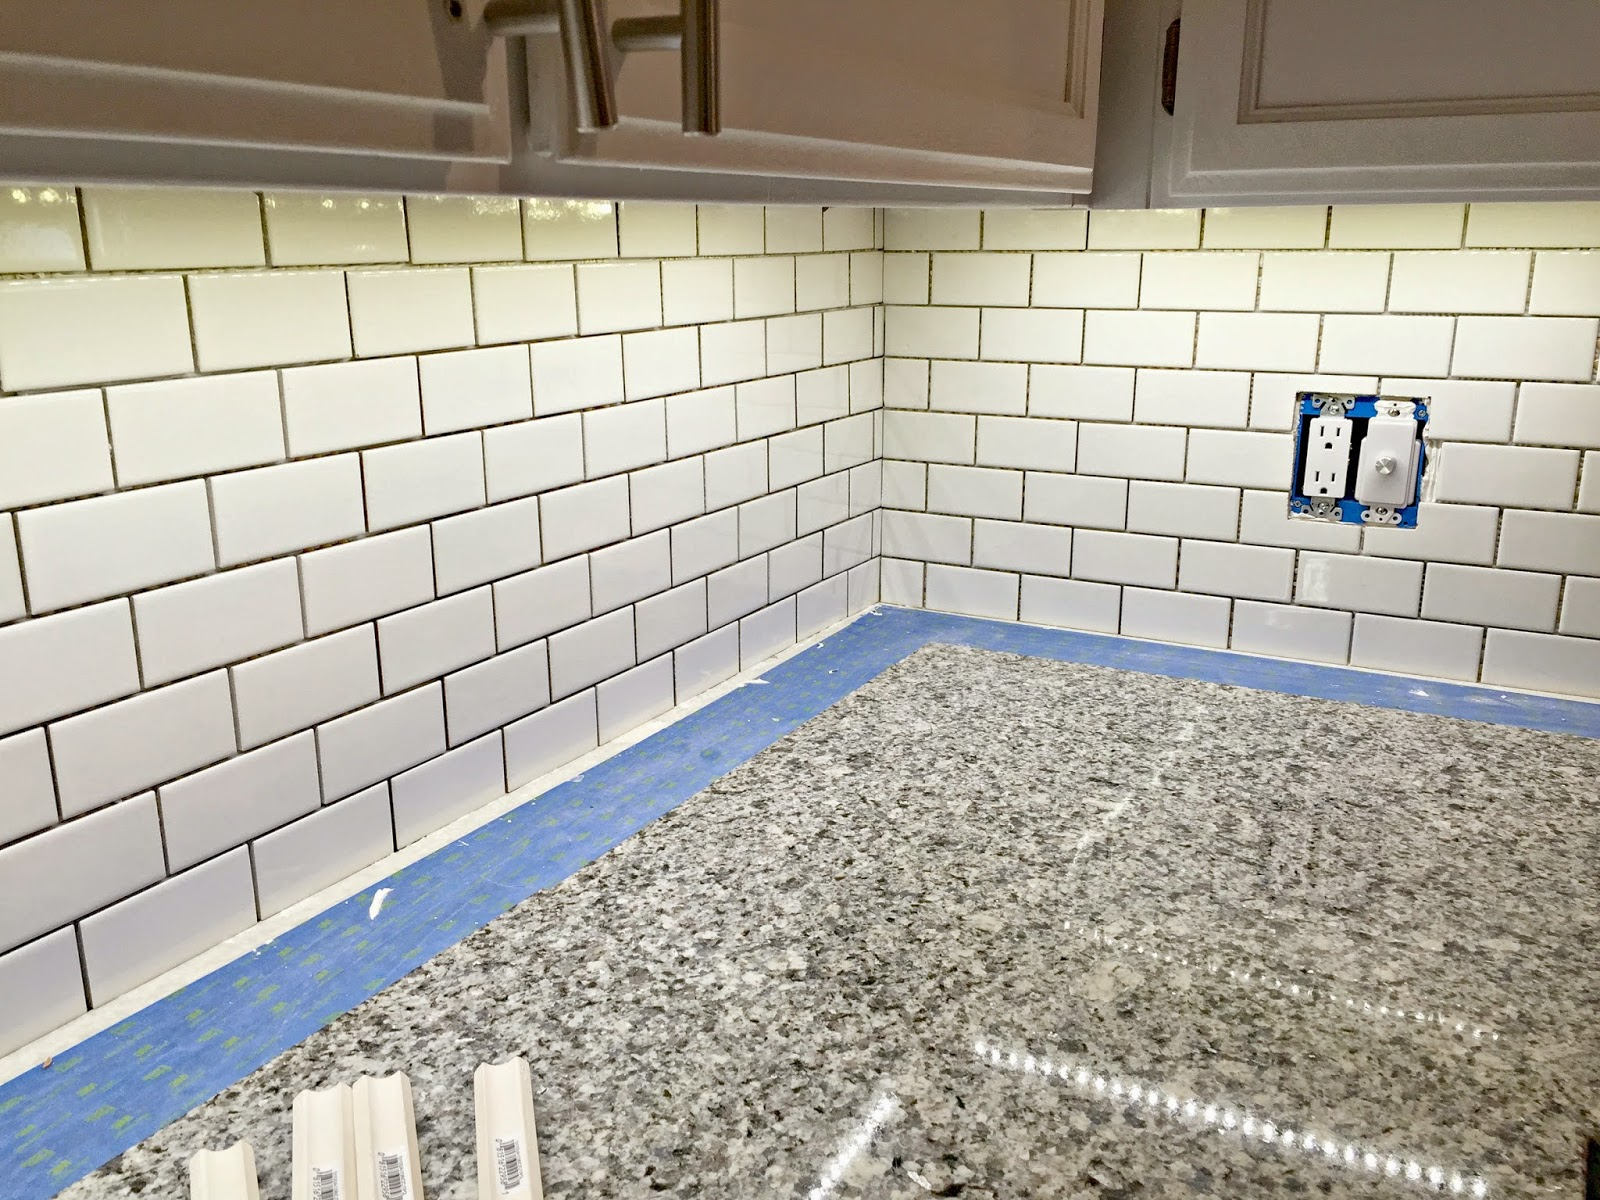 Backsplash Corners Diy Kitchen Backsplash Tiles Meeting In The